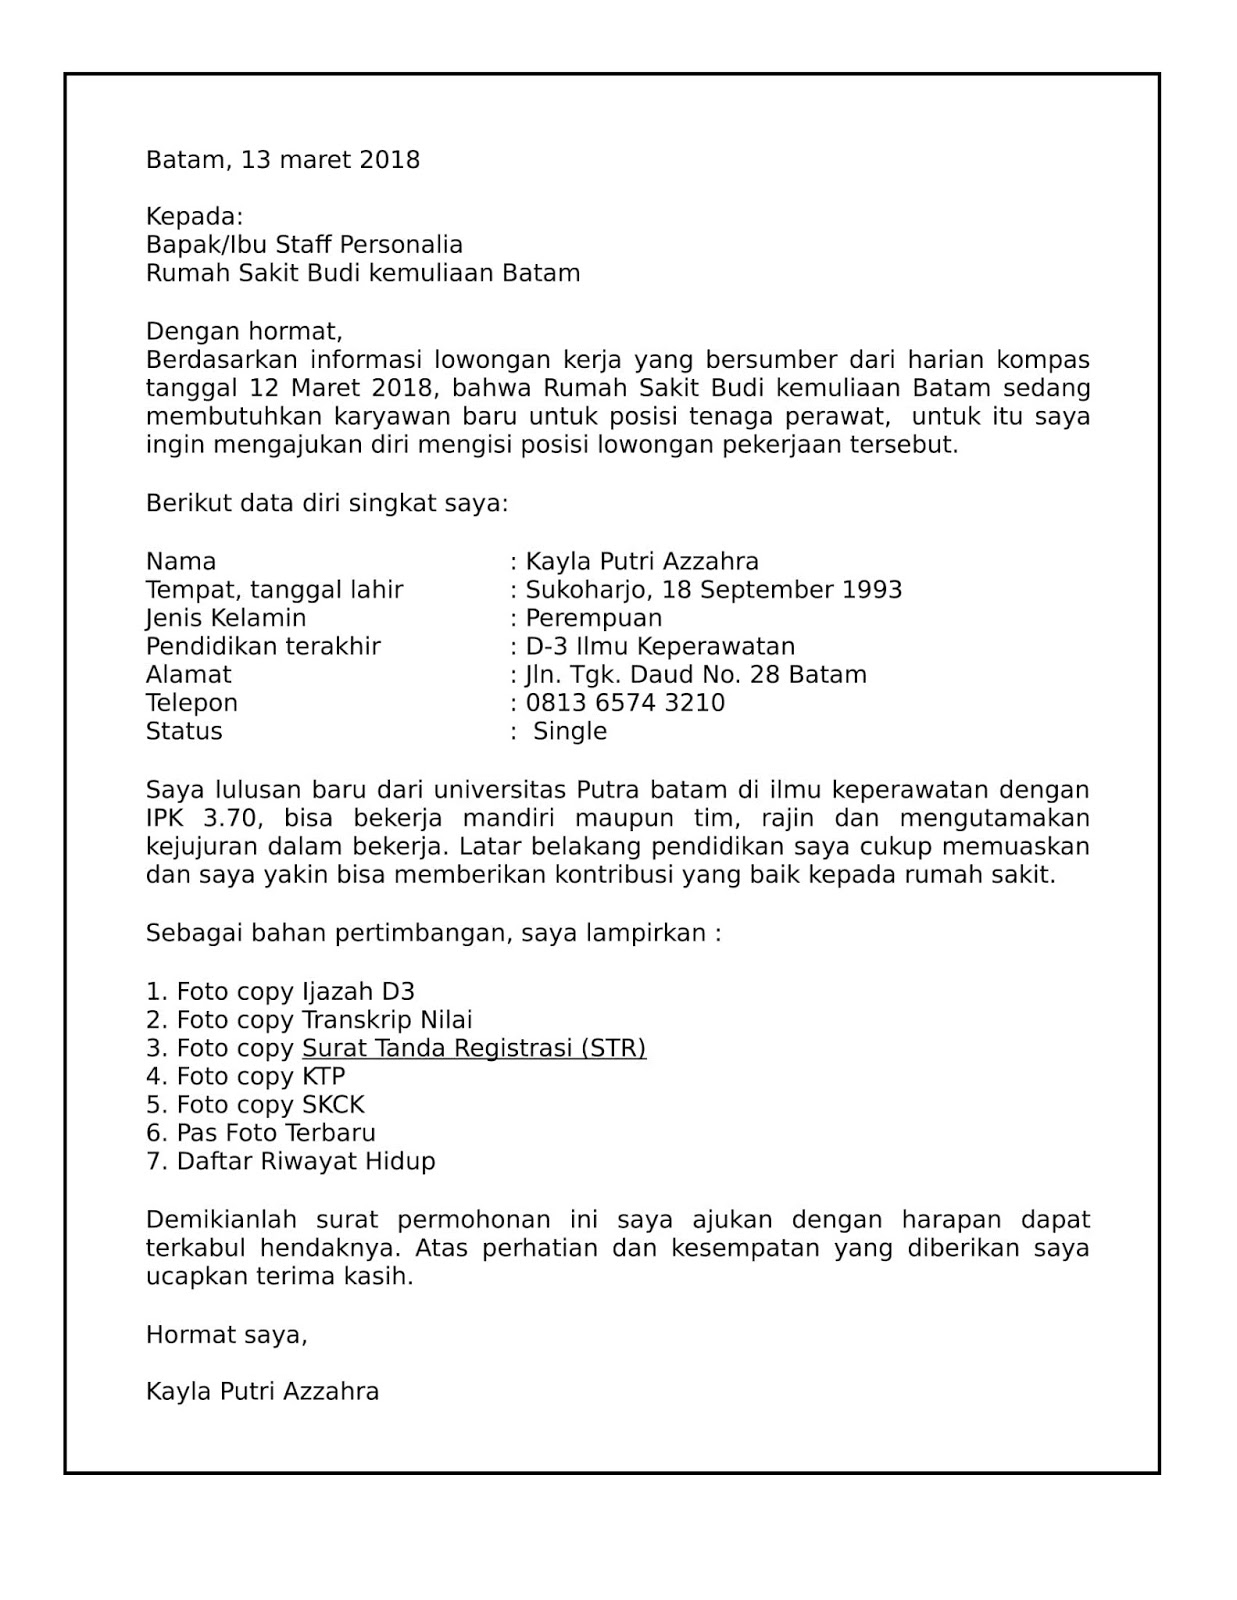 Contoh Surat Lamaran Pekerjaan Perawat